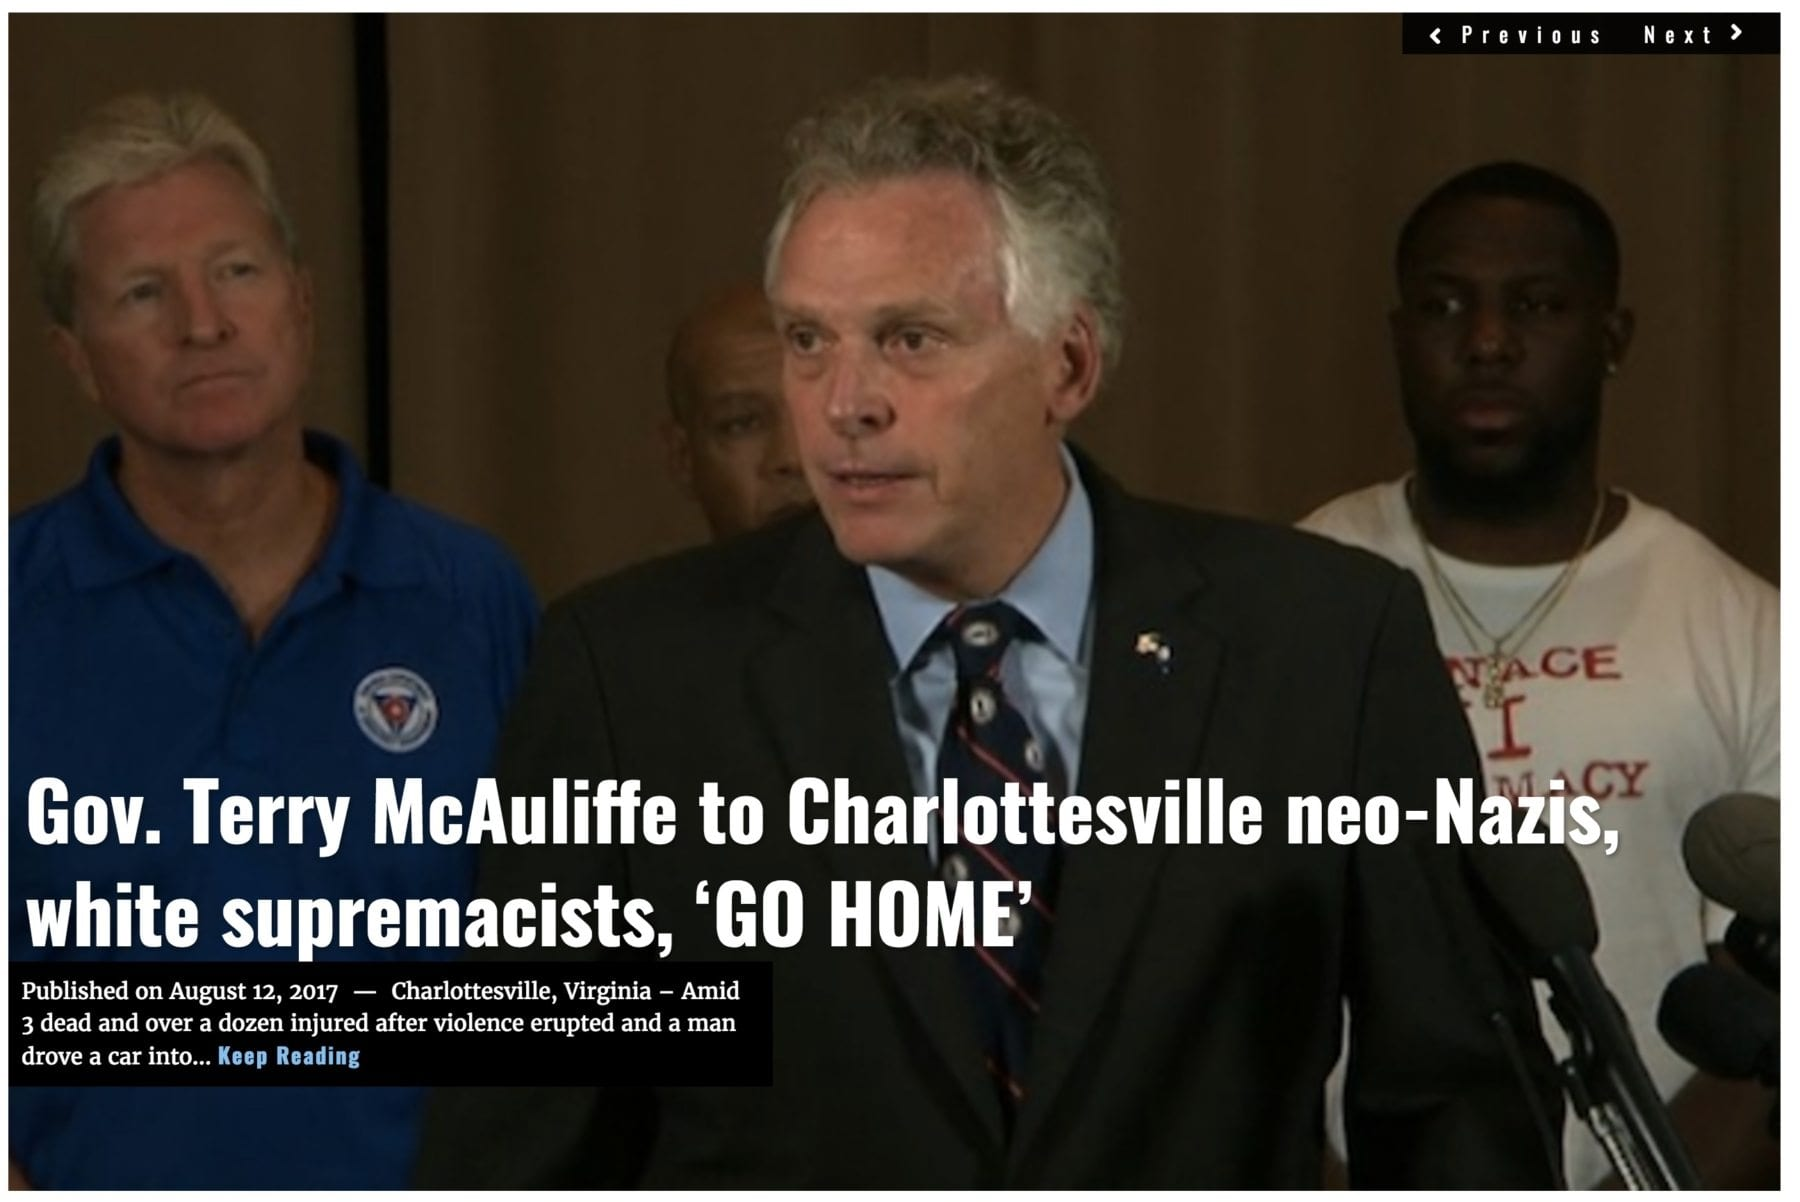 Image Lima Charlie News headline Charlottesville AUG 12